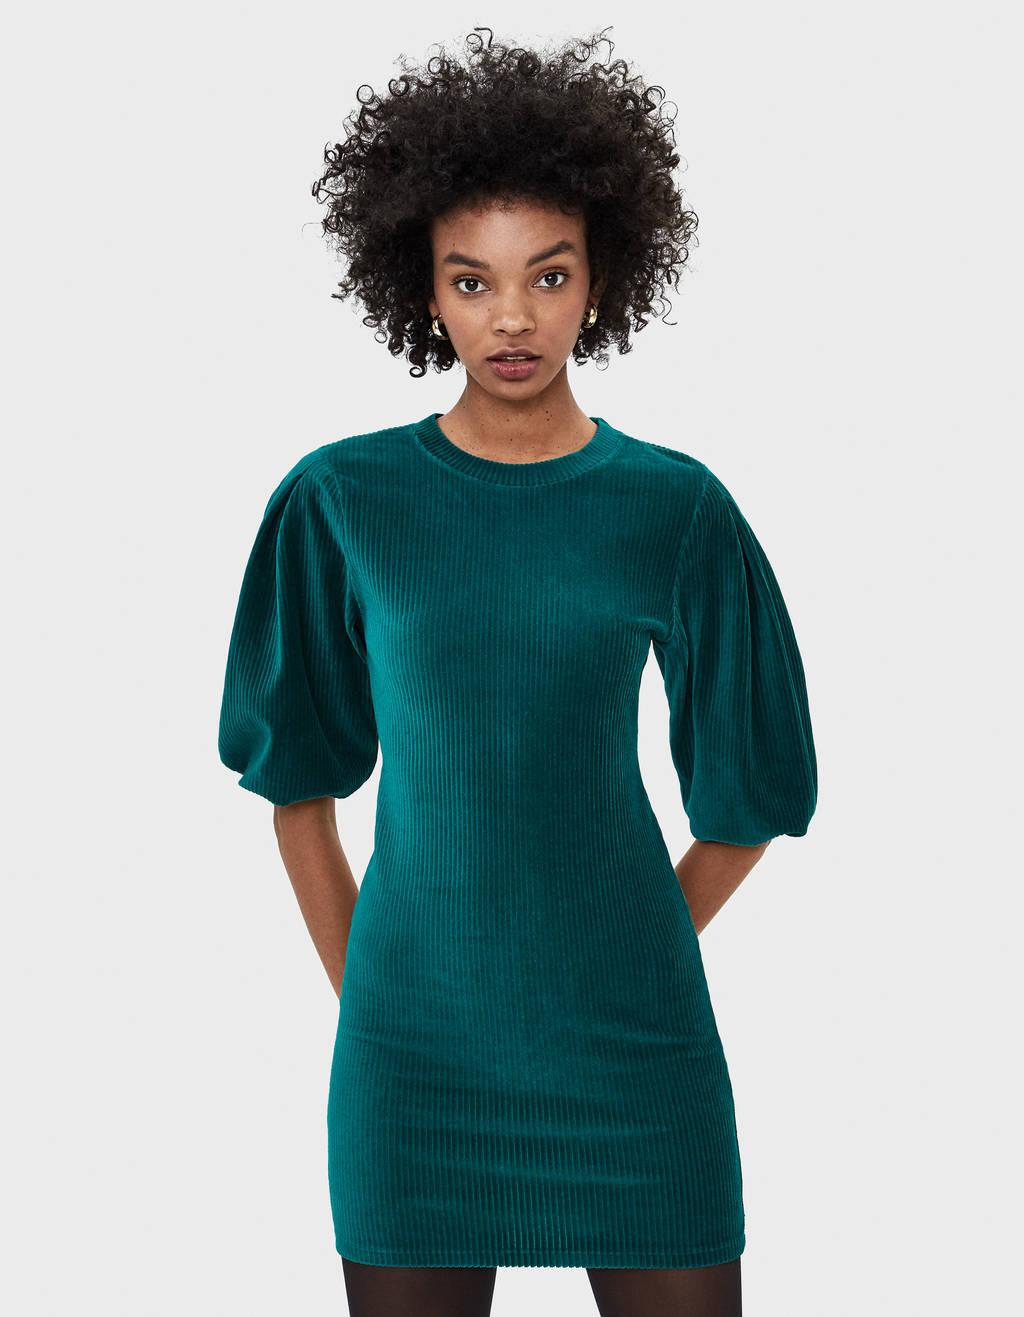 Puff sleeve corduroy dress